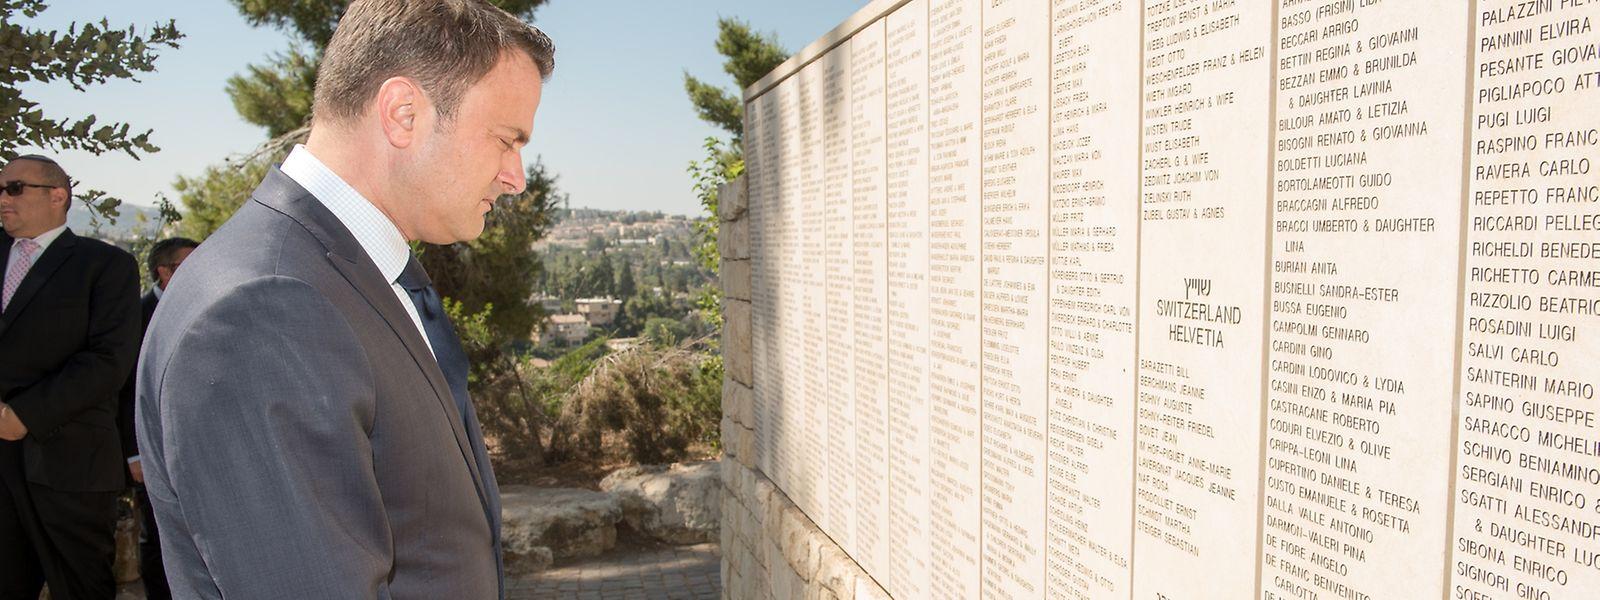 Xavier Bettel au mémorial de Yad Vashem.